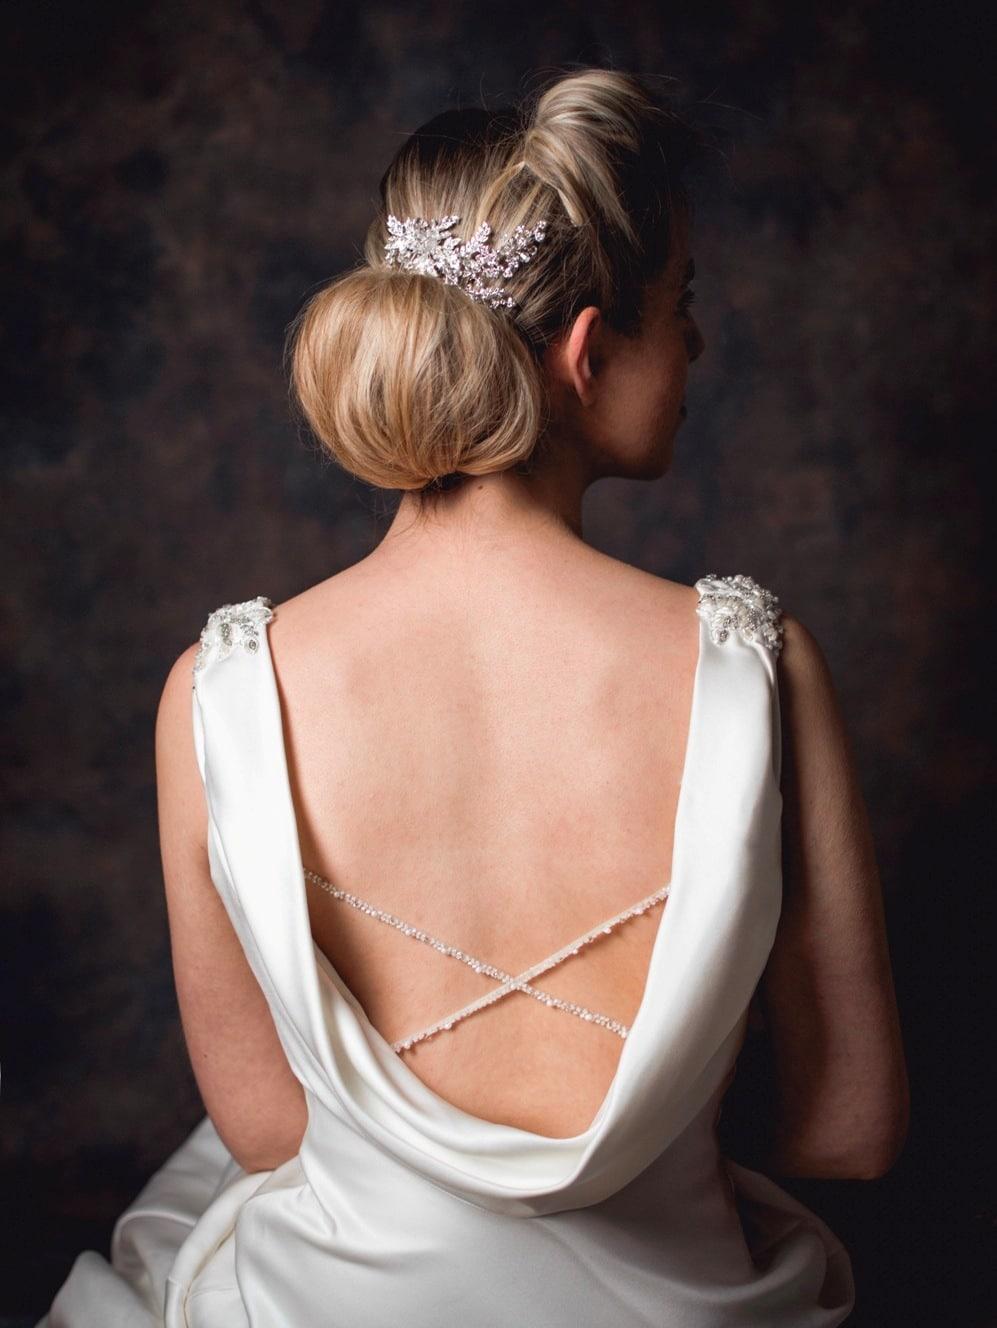 Rita - Vintage bridal hair comb with diamante leaves on model bride TLH3001